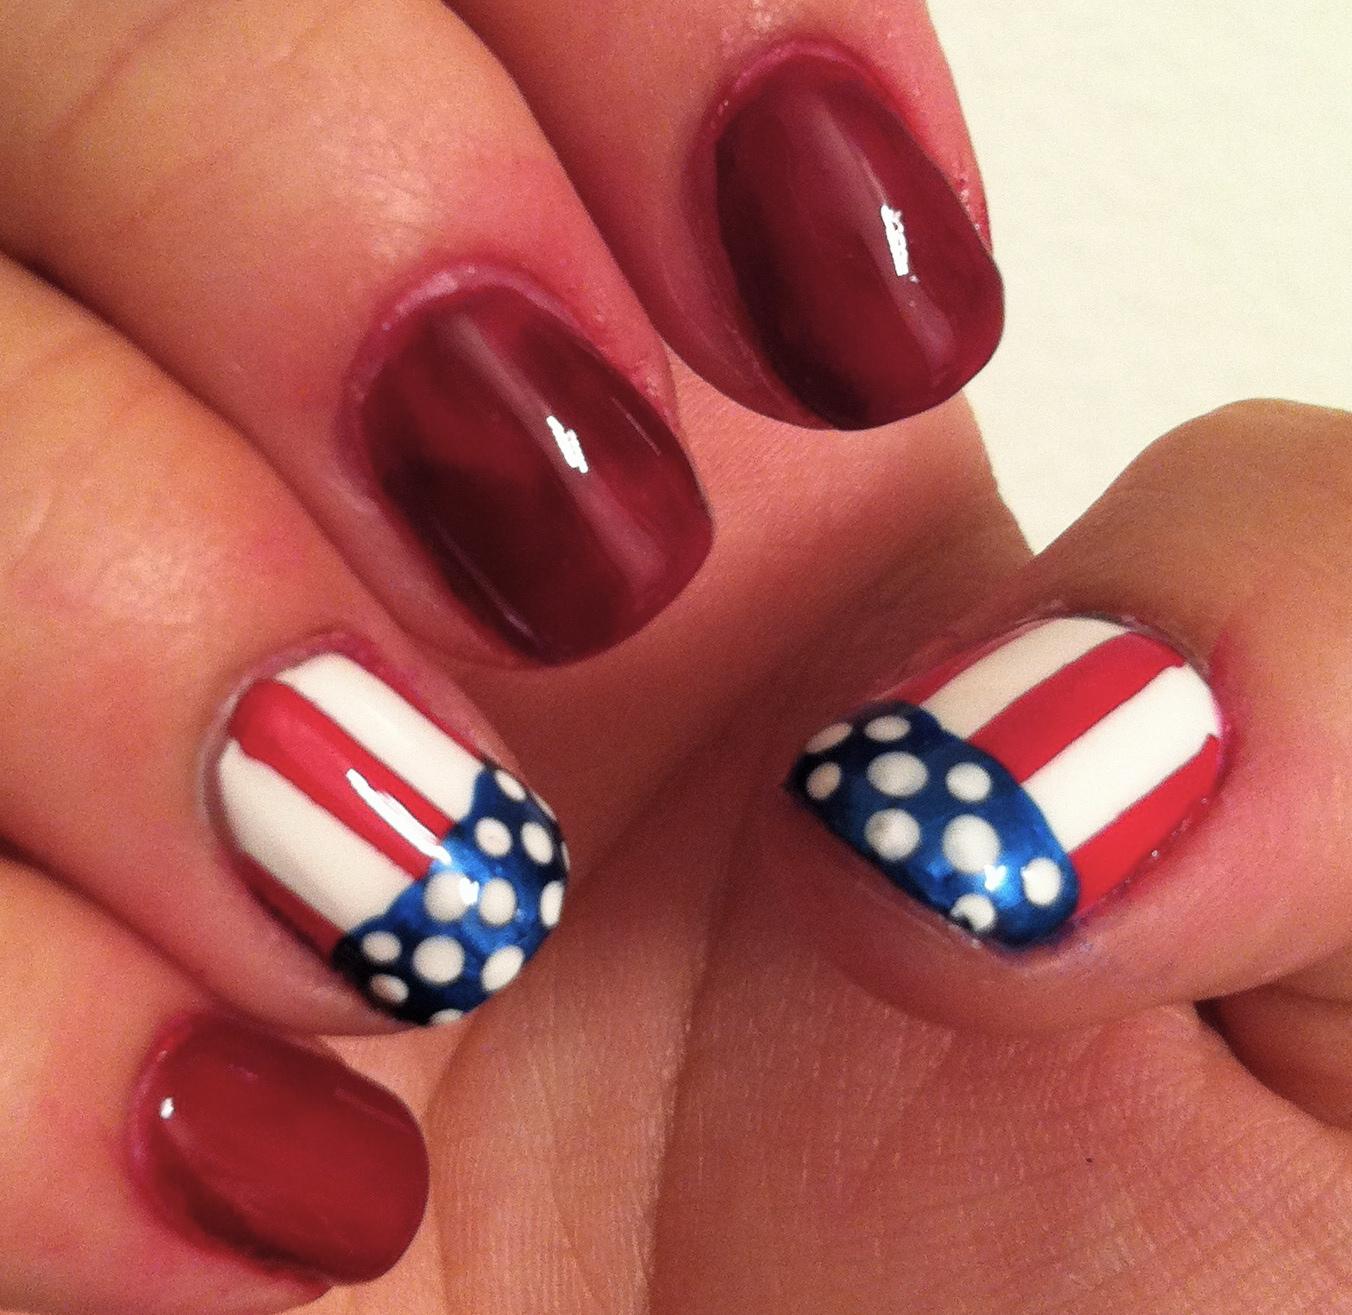 Handtastic Intentions: Nail Art: Patriotic Nail Designs!